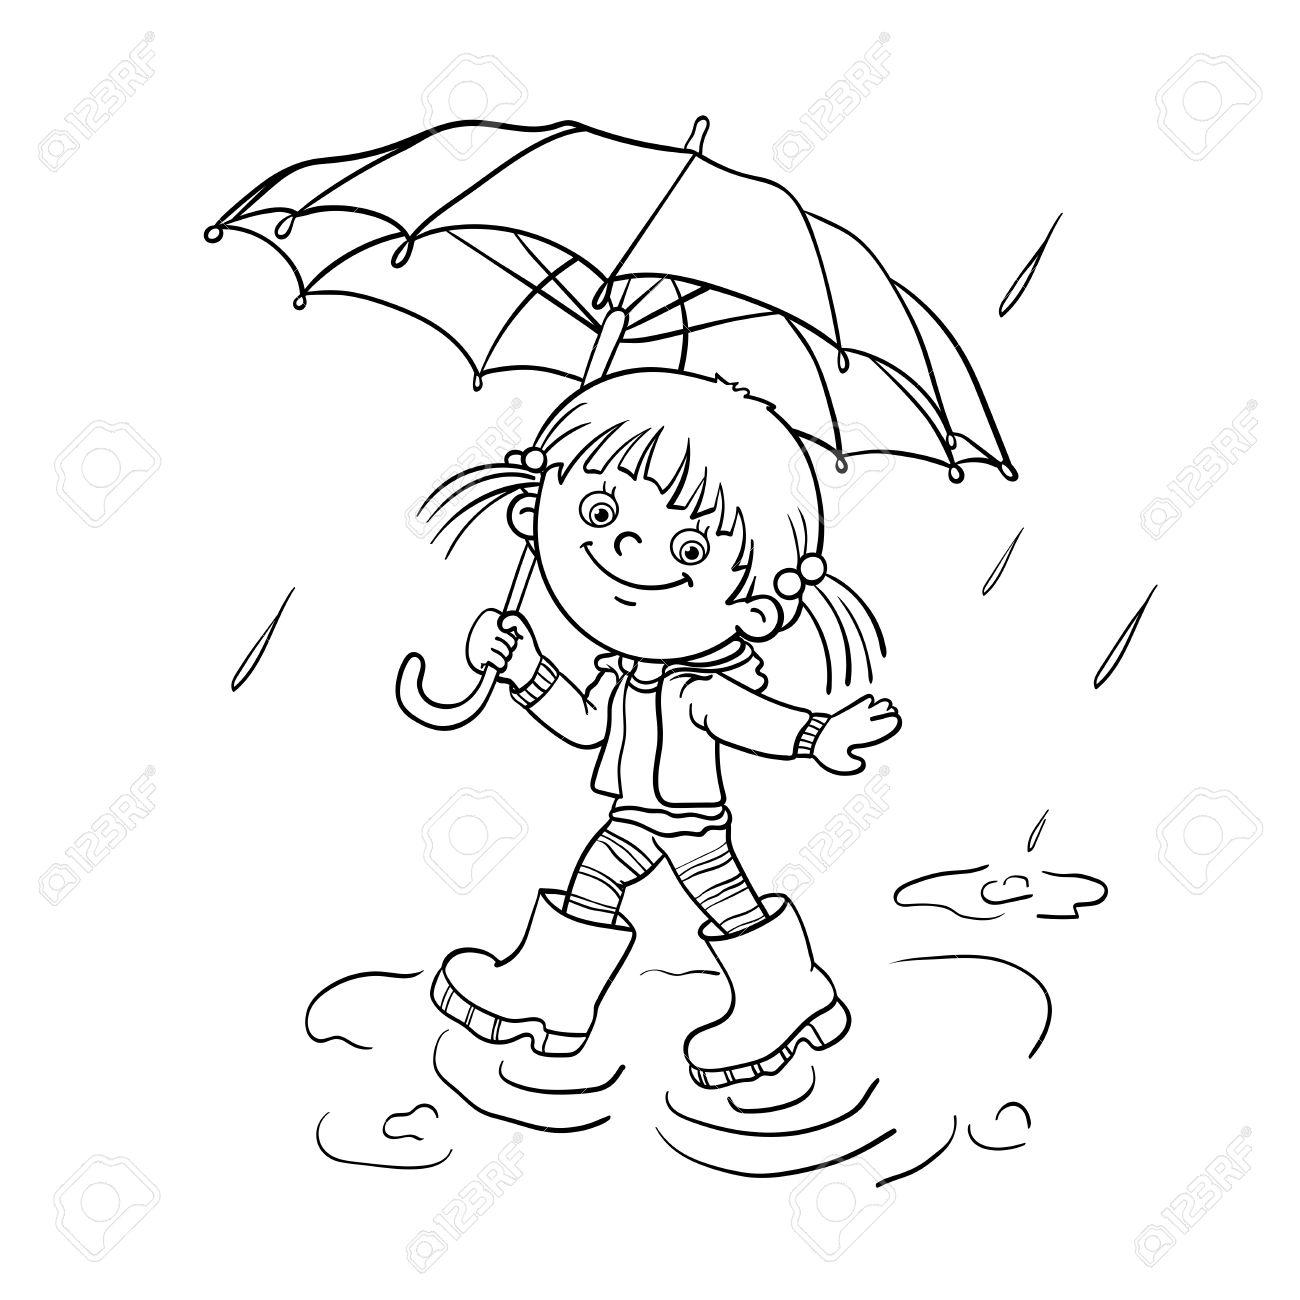 lluvia para colorear - Gidiye.redformapolitica.co